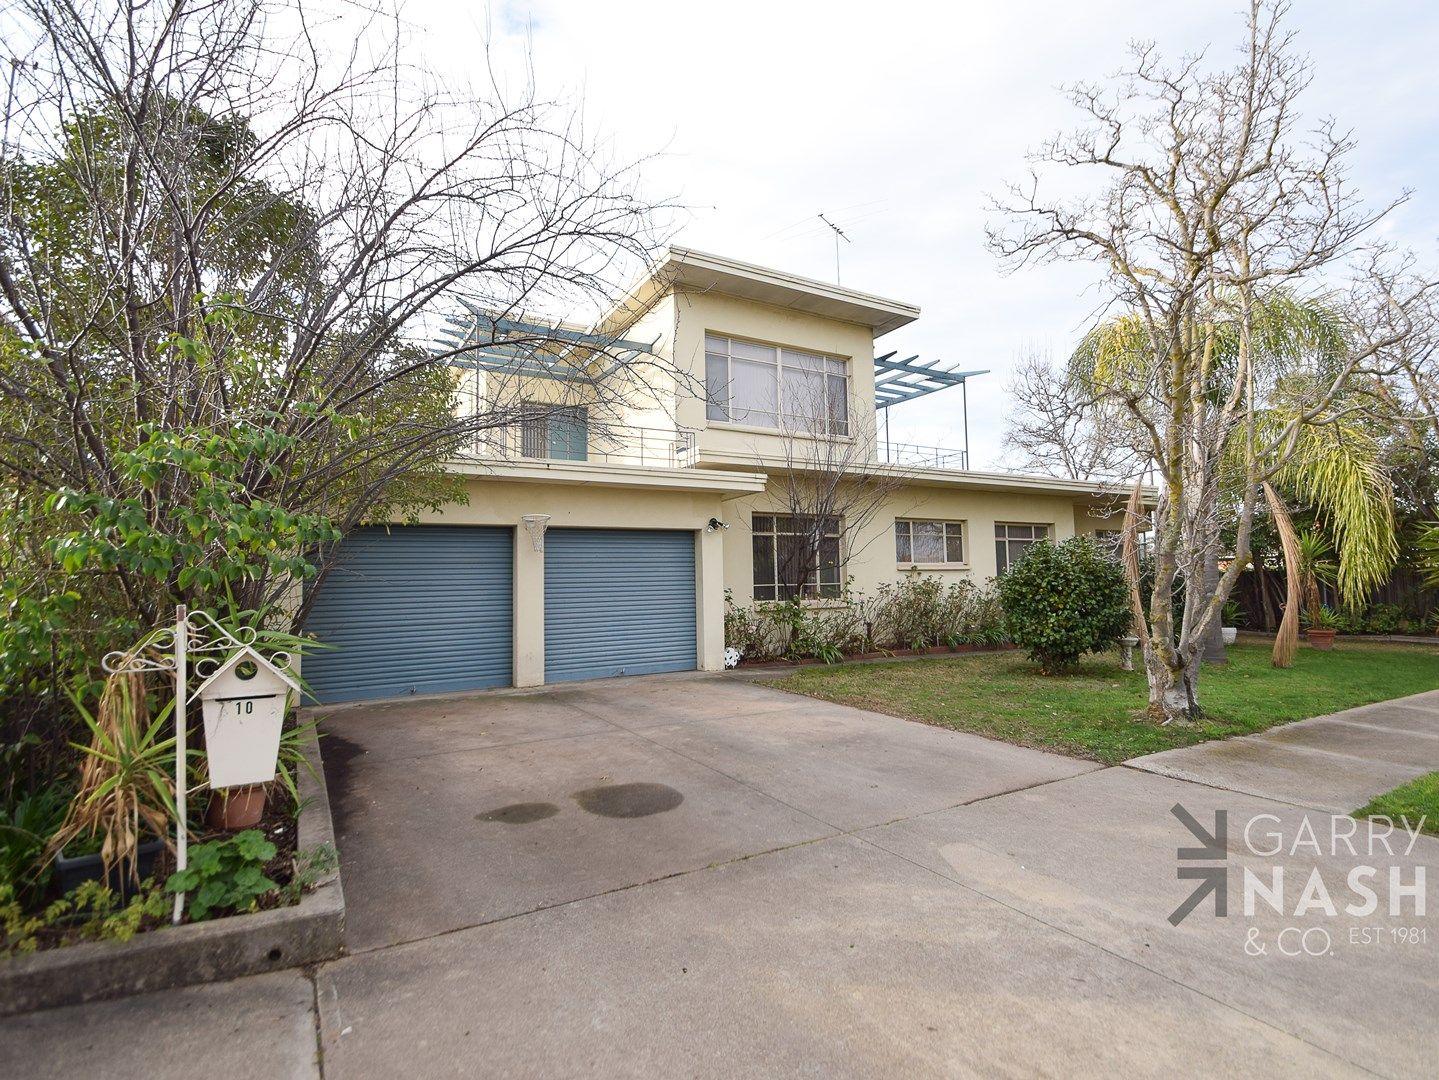 10 Taylor Street, Wangaratta VIC 3677, Image 0